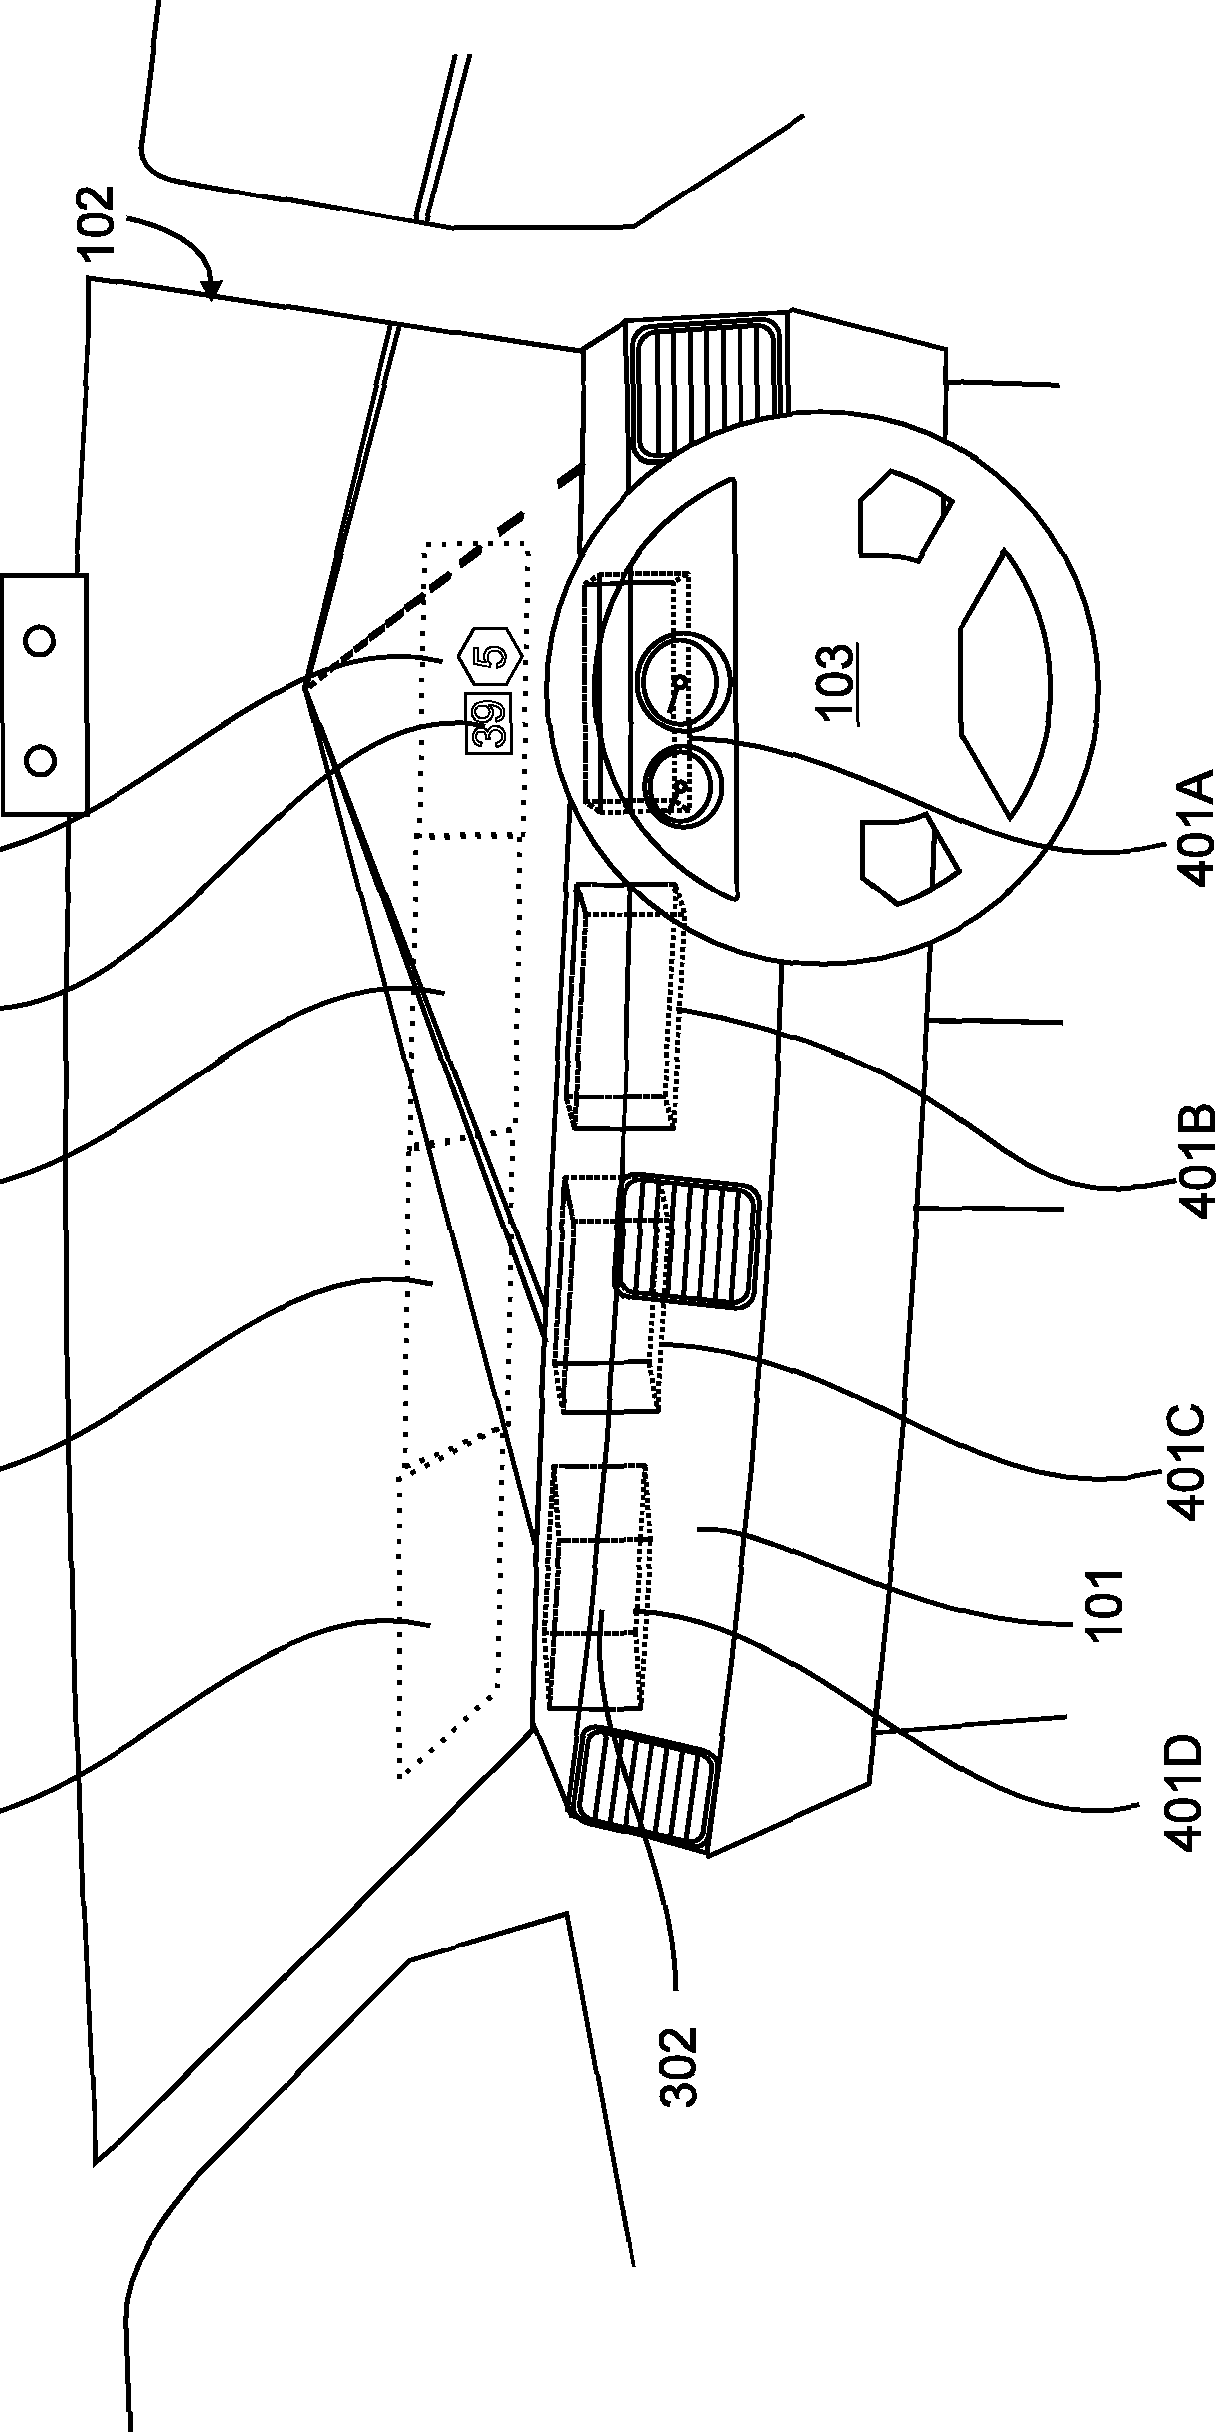 Figure GB2559606A_D0005